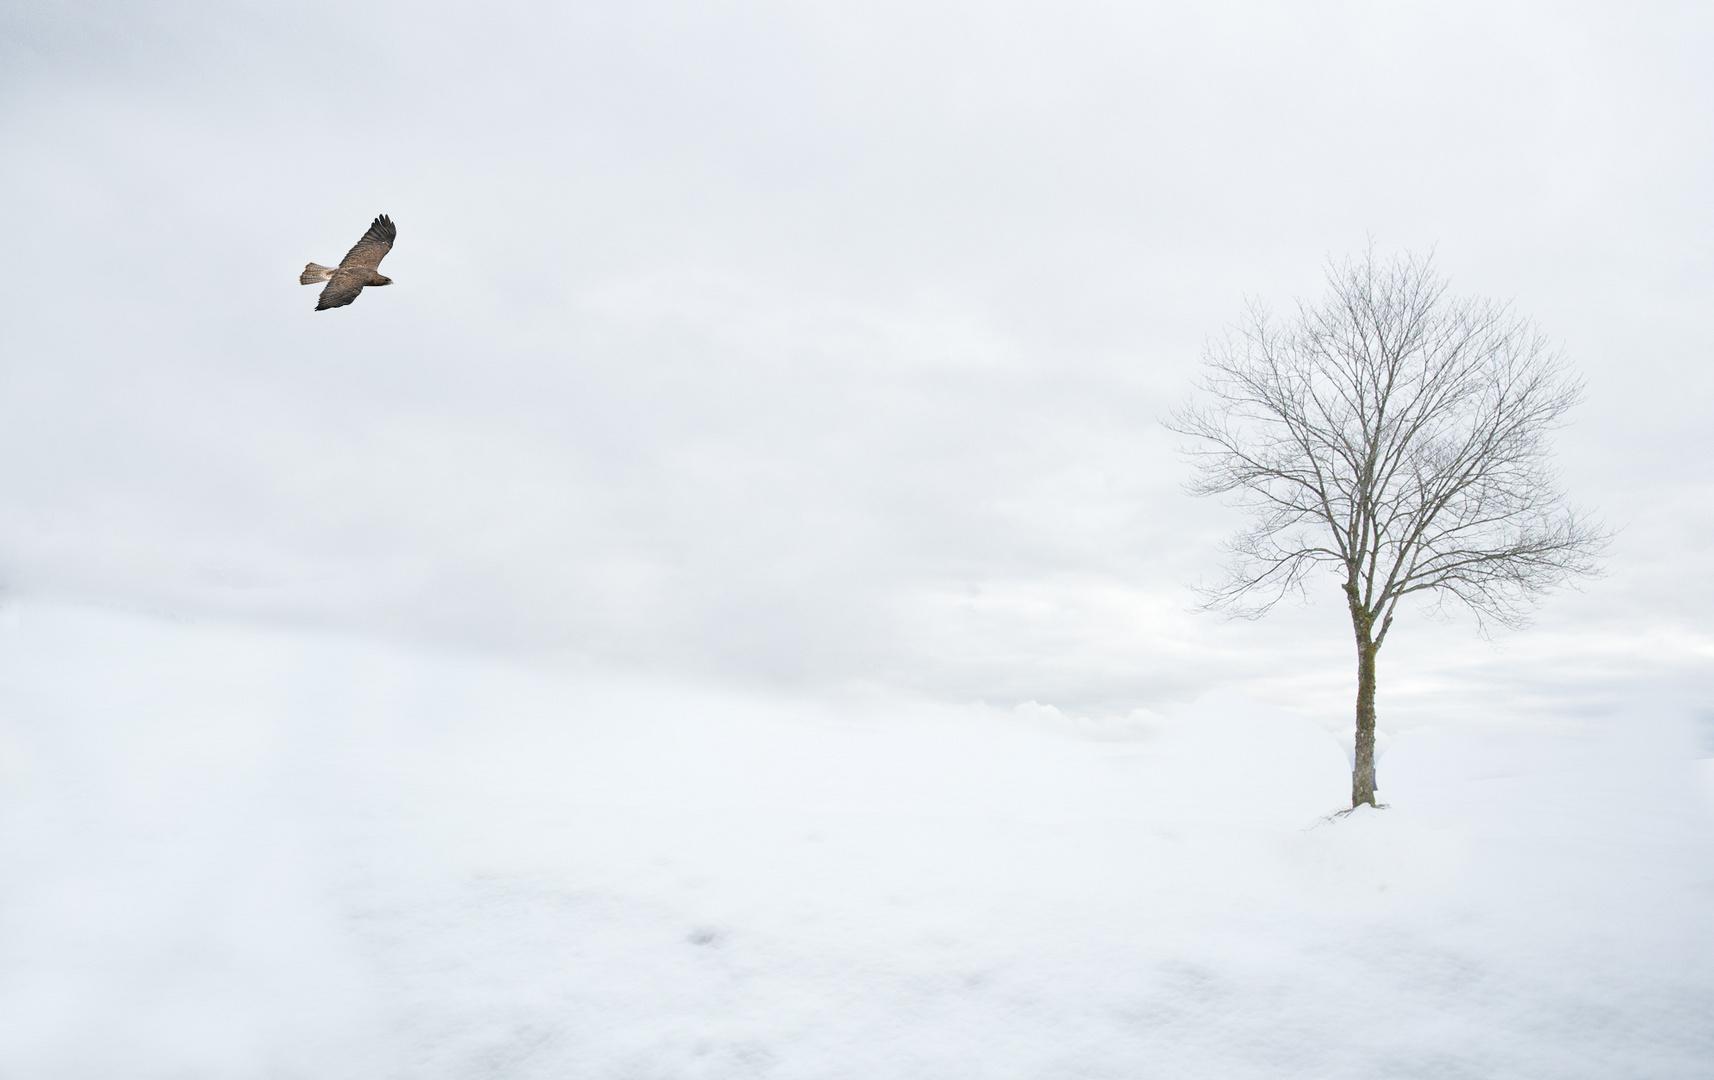 Pájaro, árbol y nieve